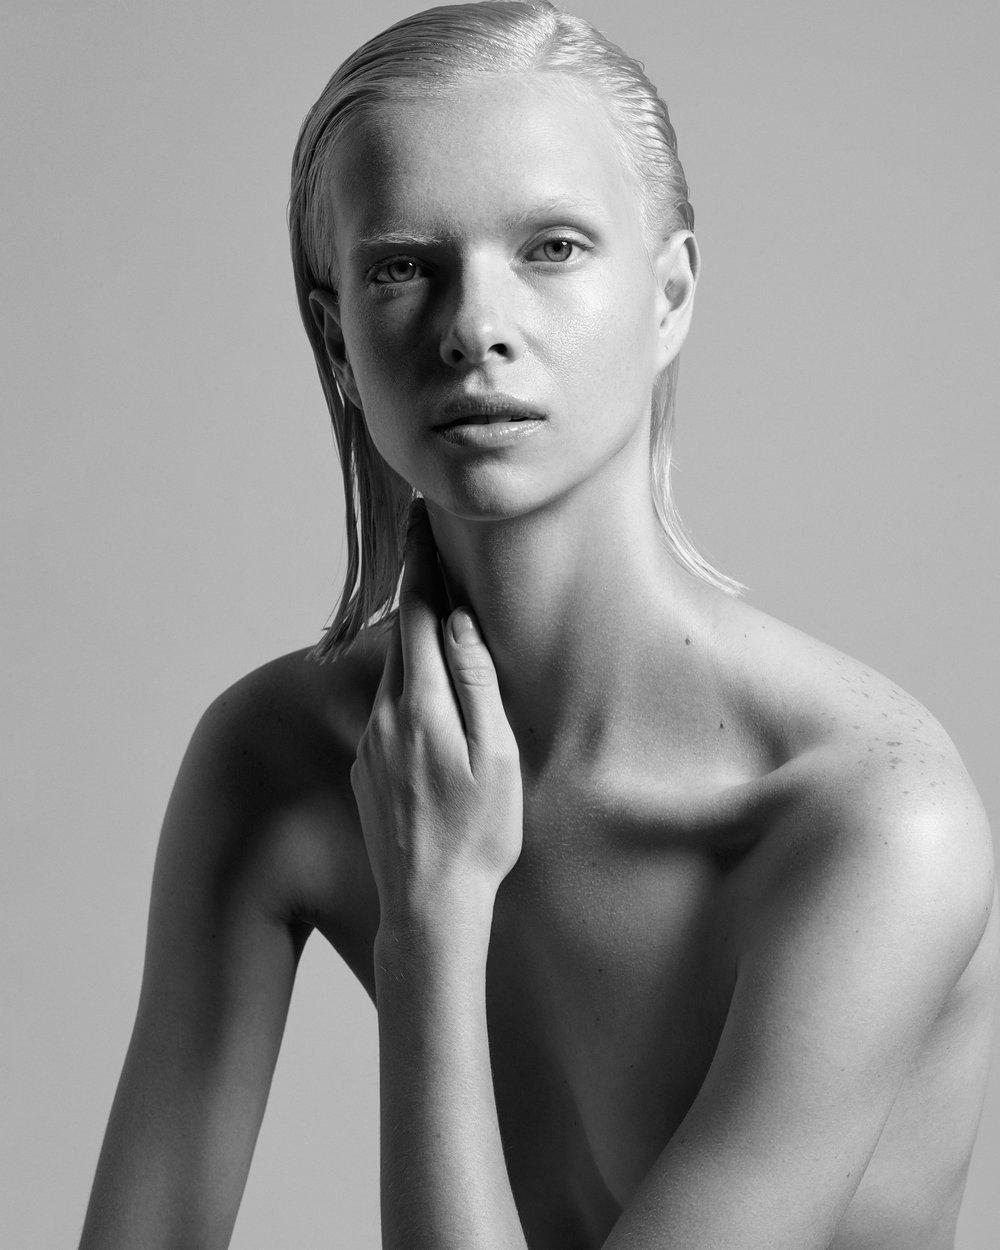 Alyona-Portrait-1b.jpg